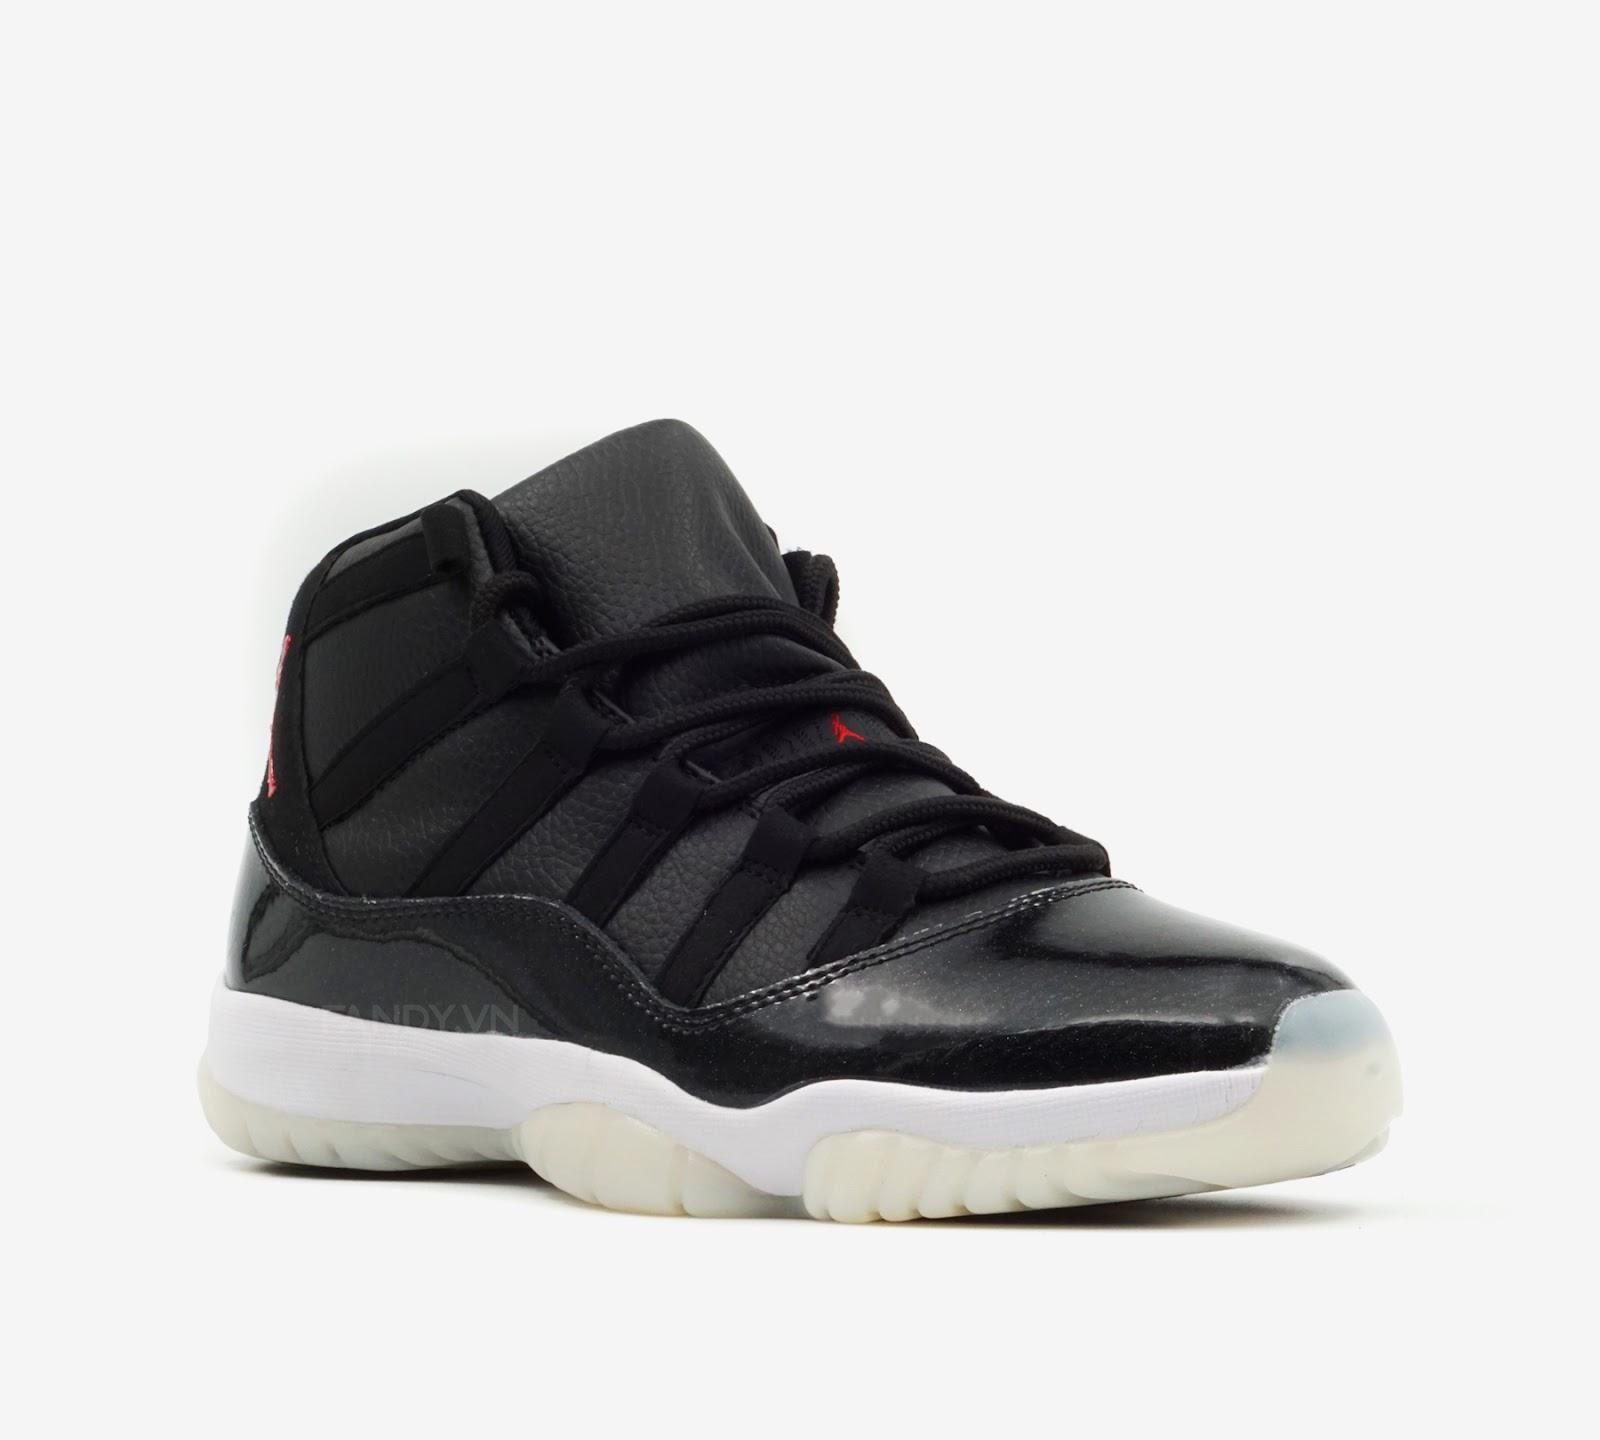 Giày Nike Air Jordan 11 Retro  72-10  Black/Gym Red-White